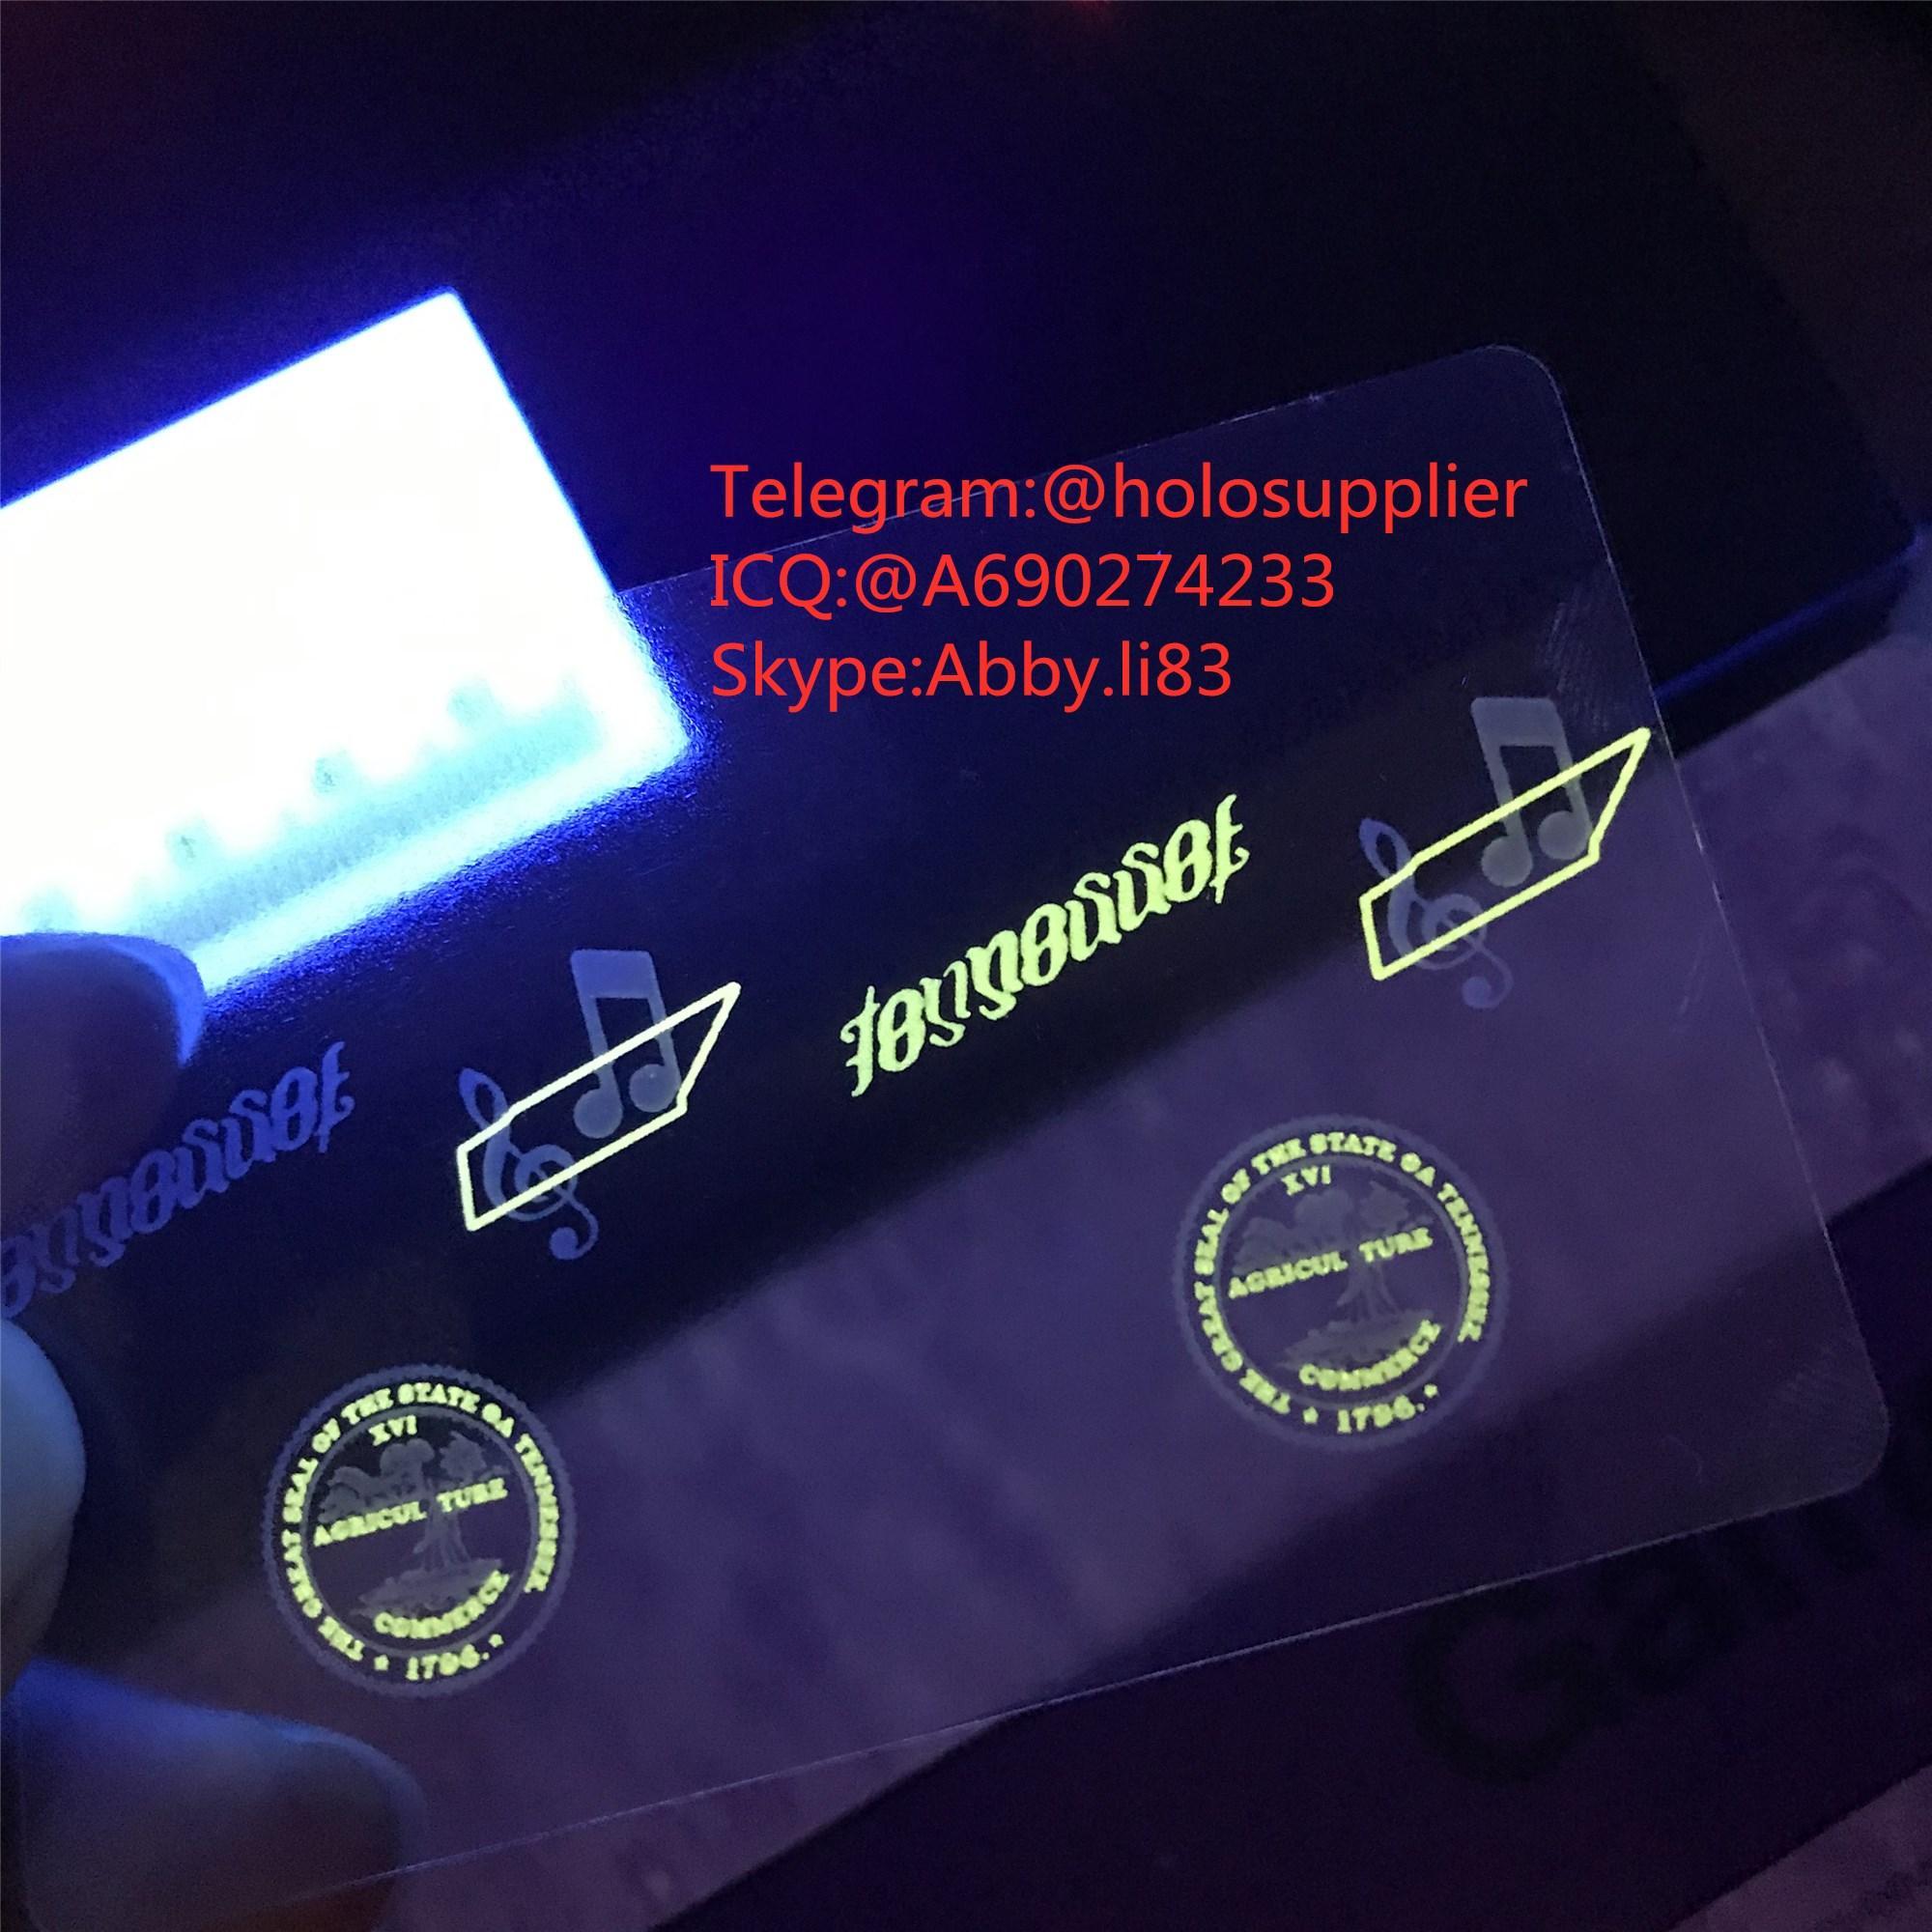 Tennessee ID hologram TN state overlay 1